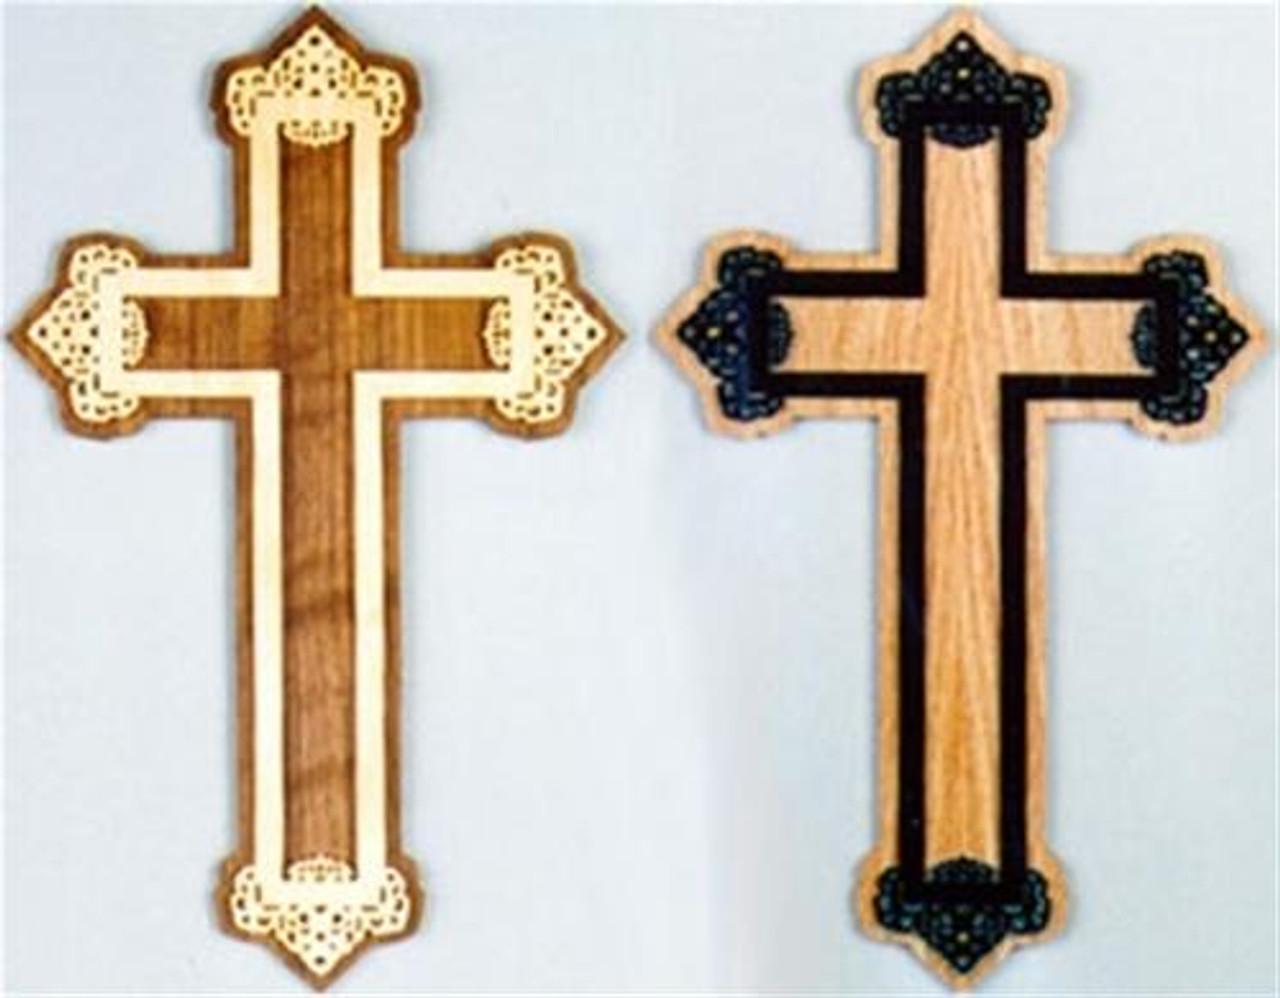 Wildwood Designs Layered Cross Scroll Saw Plan